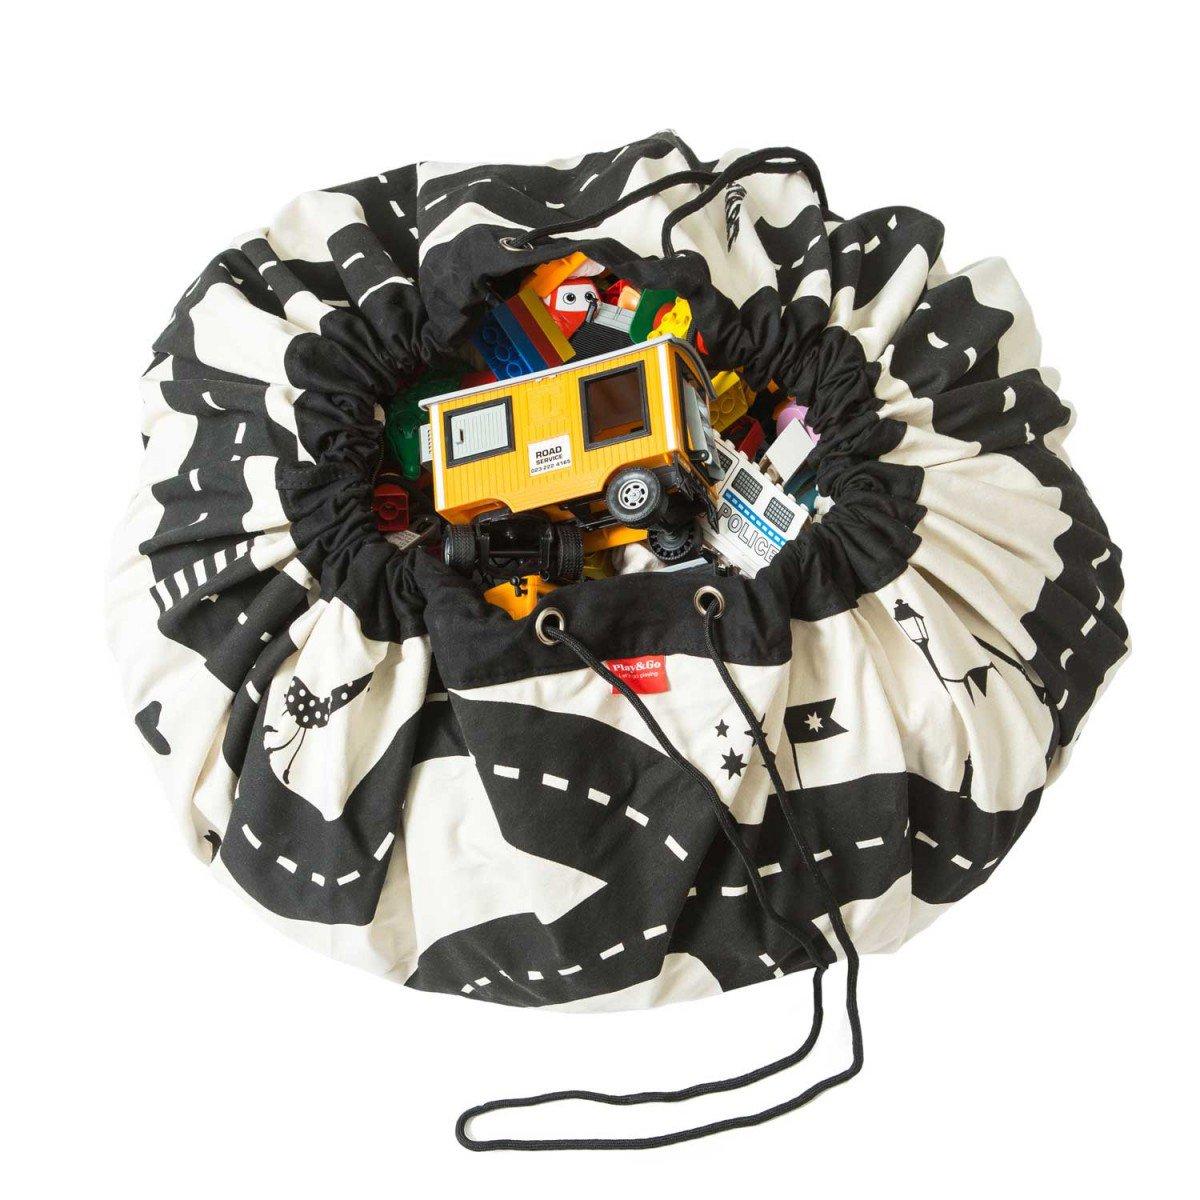 Play & Go PG729 2 in 1 Storage Bag and Playmats, Roadmap, 140cm D'Artagnan Distribution